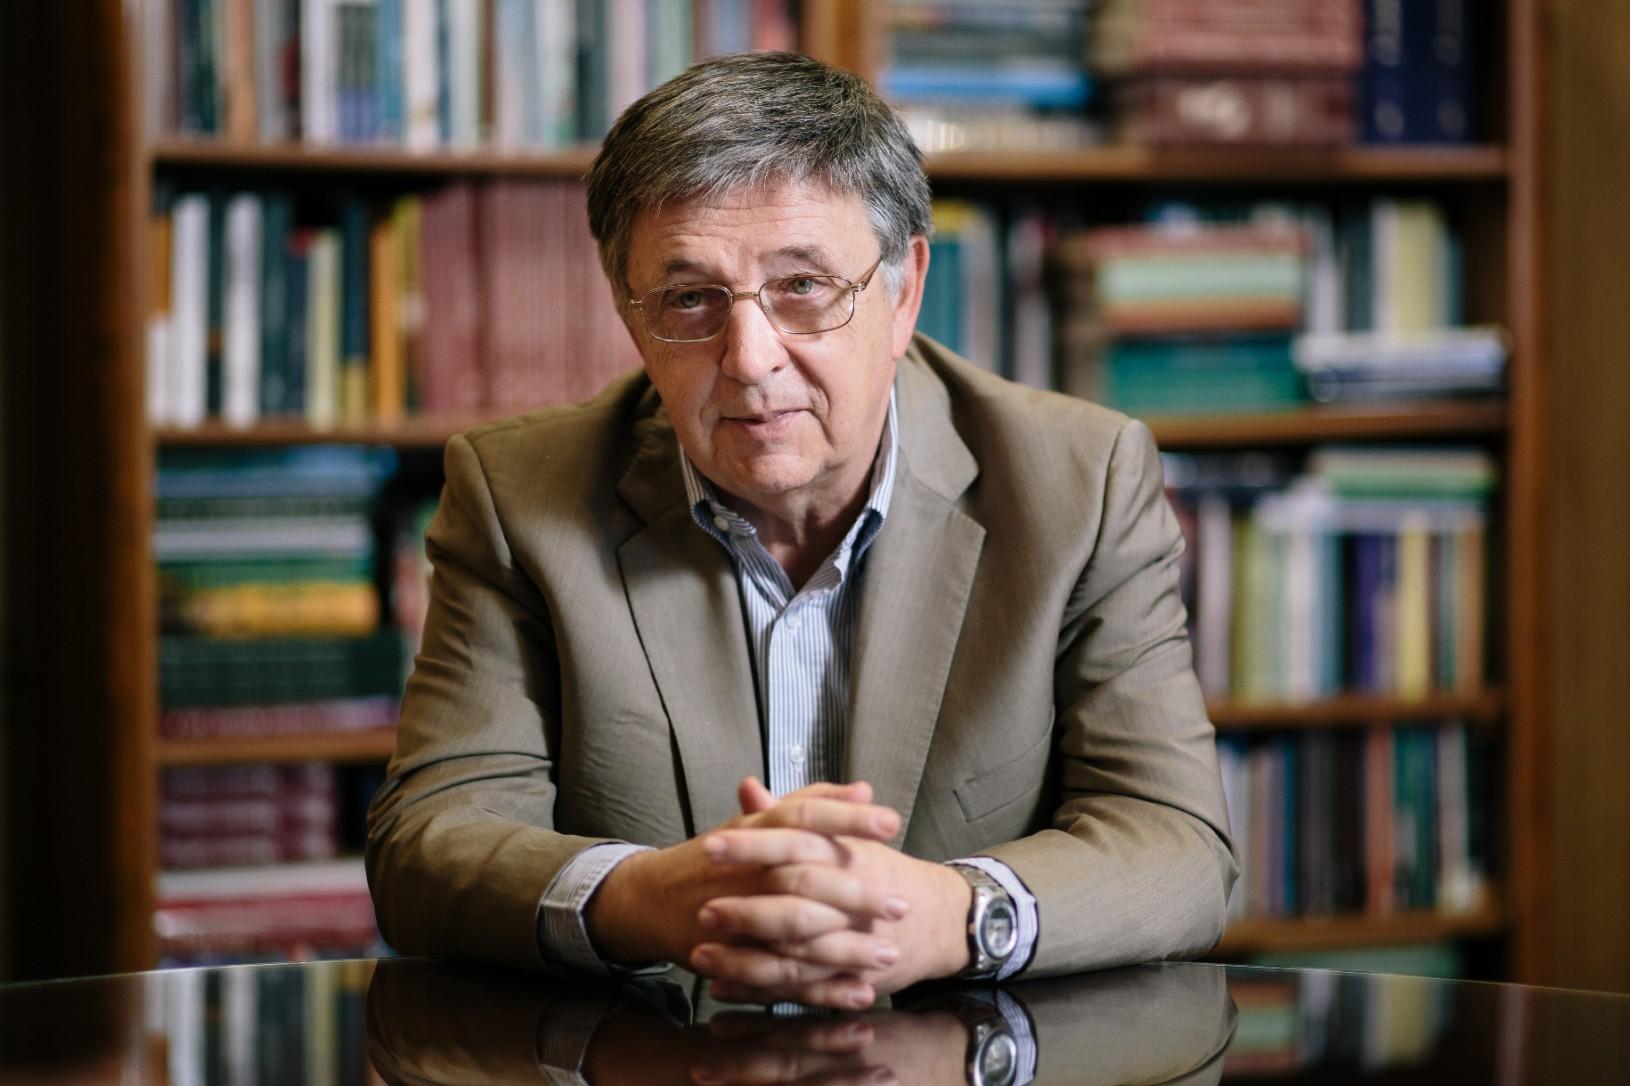 Der ungarische Mathematiker László Lovász erhielt den